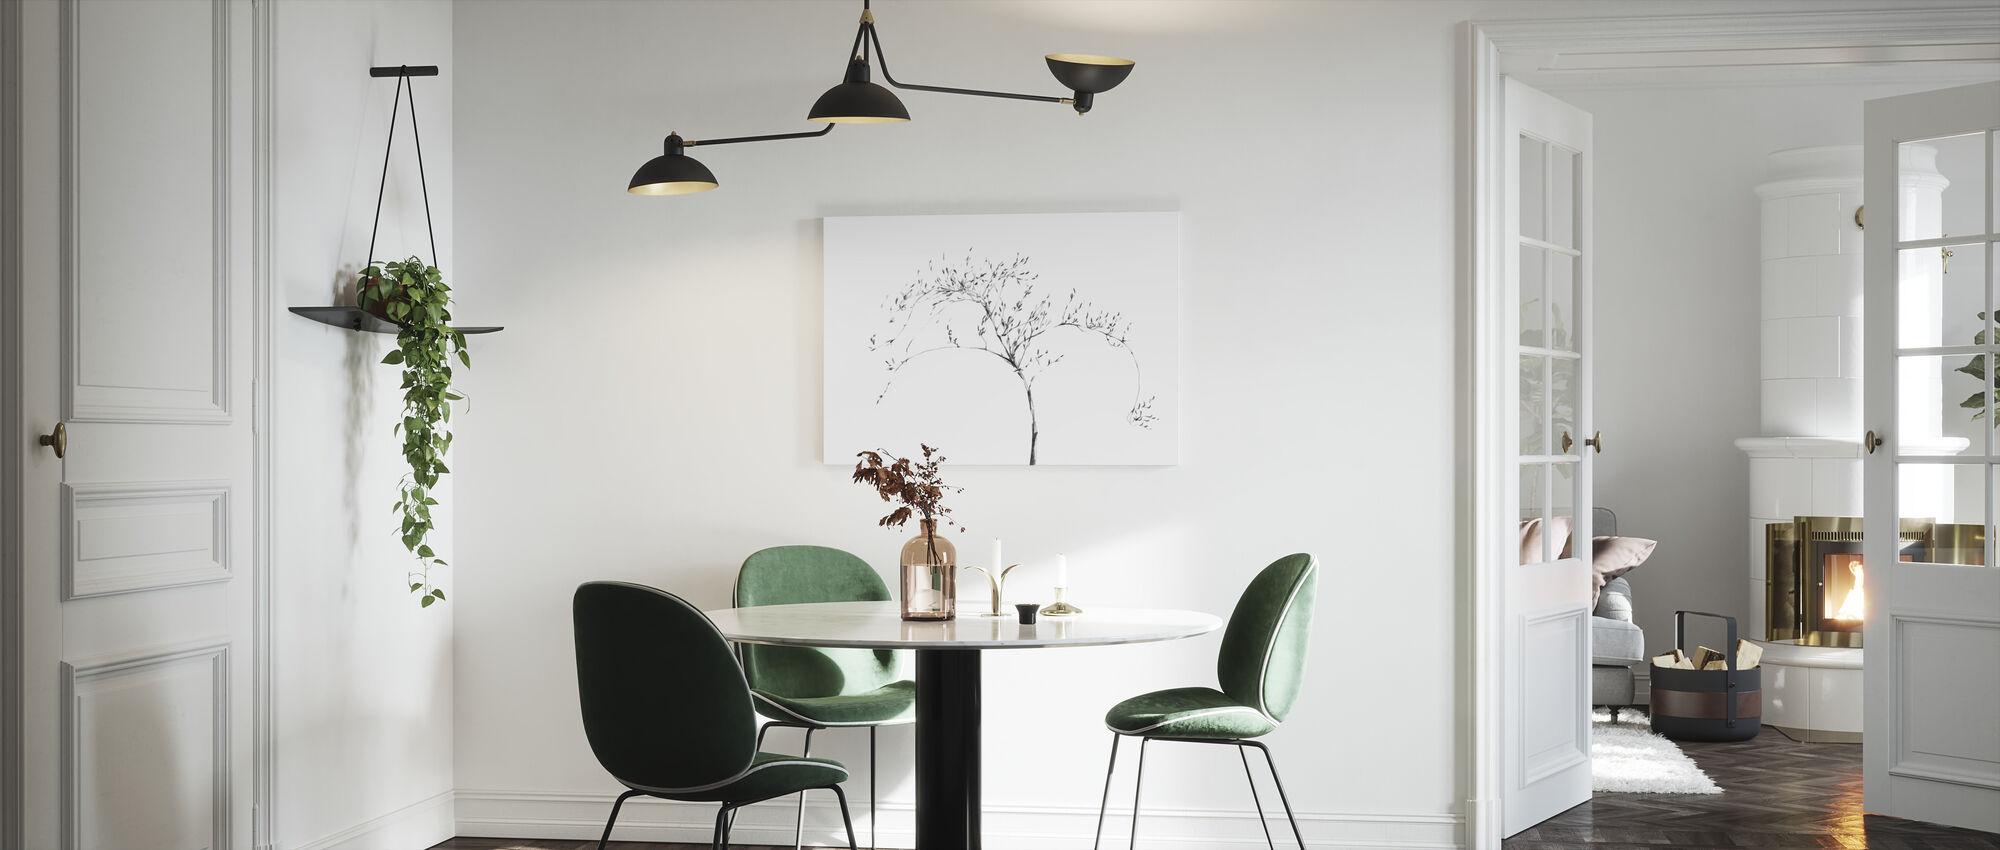 Grafiet takje - Canvas print - Keuken